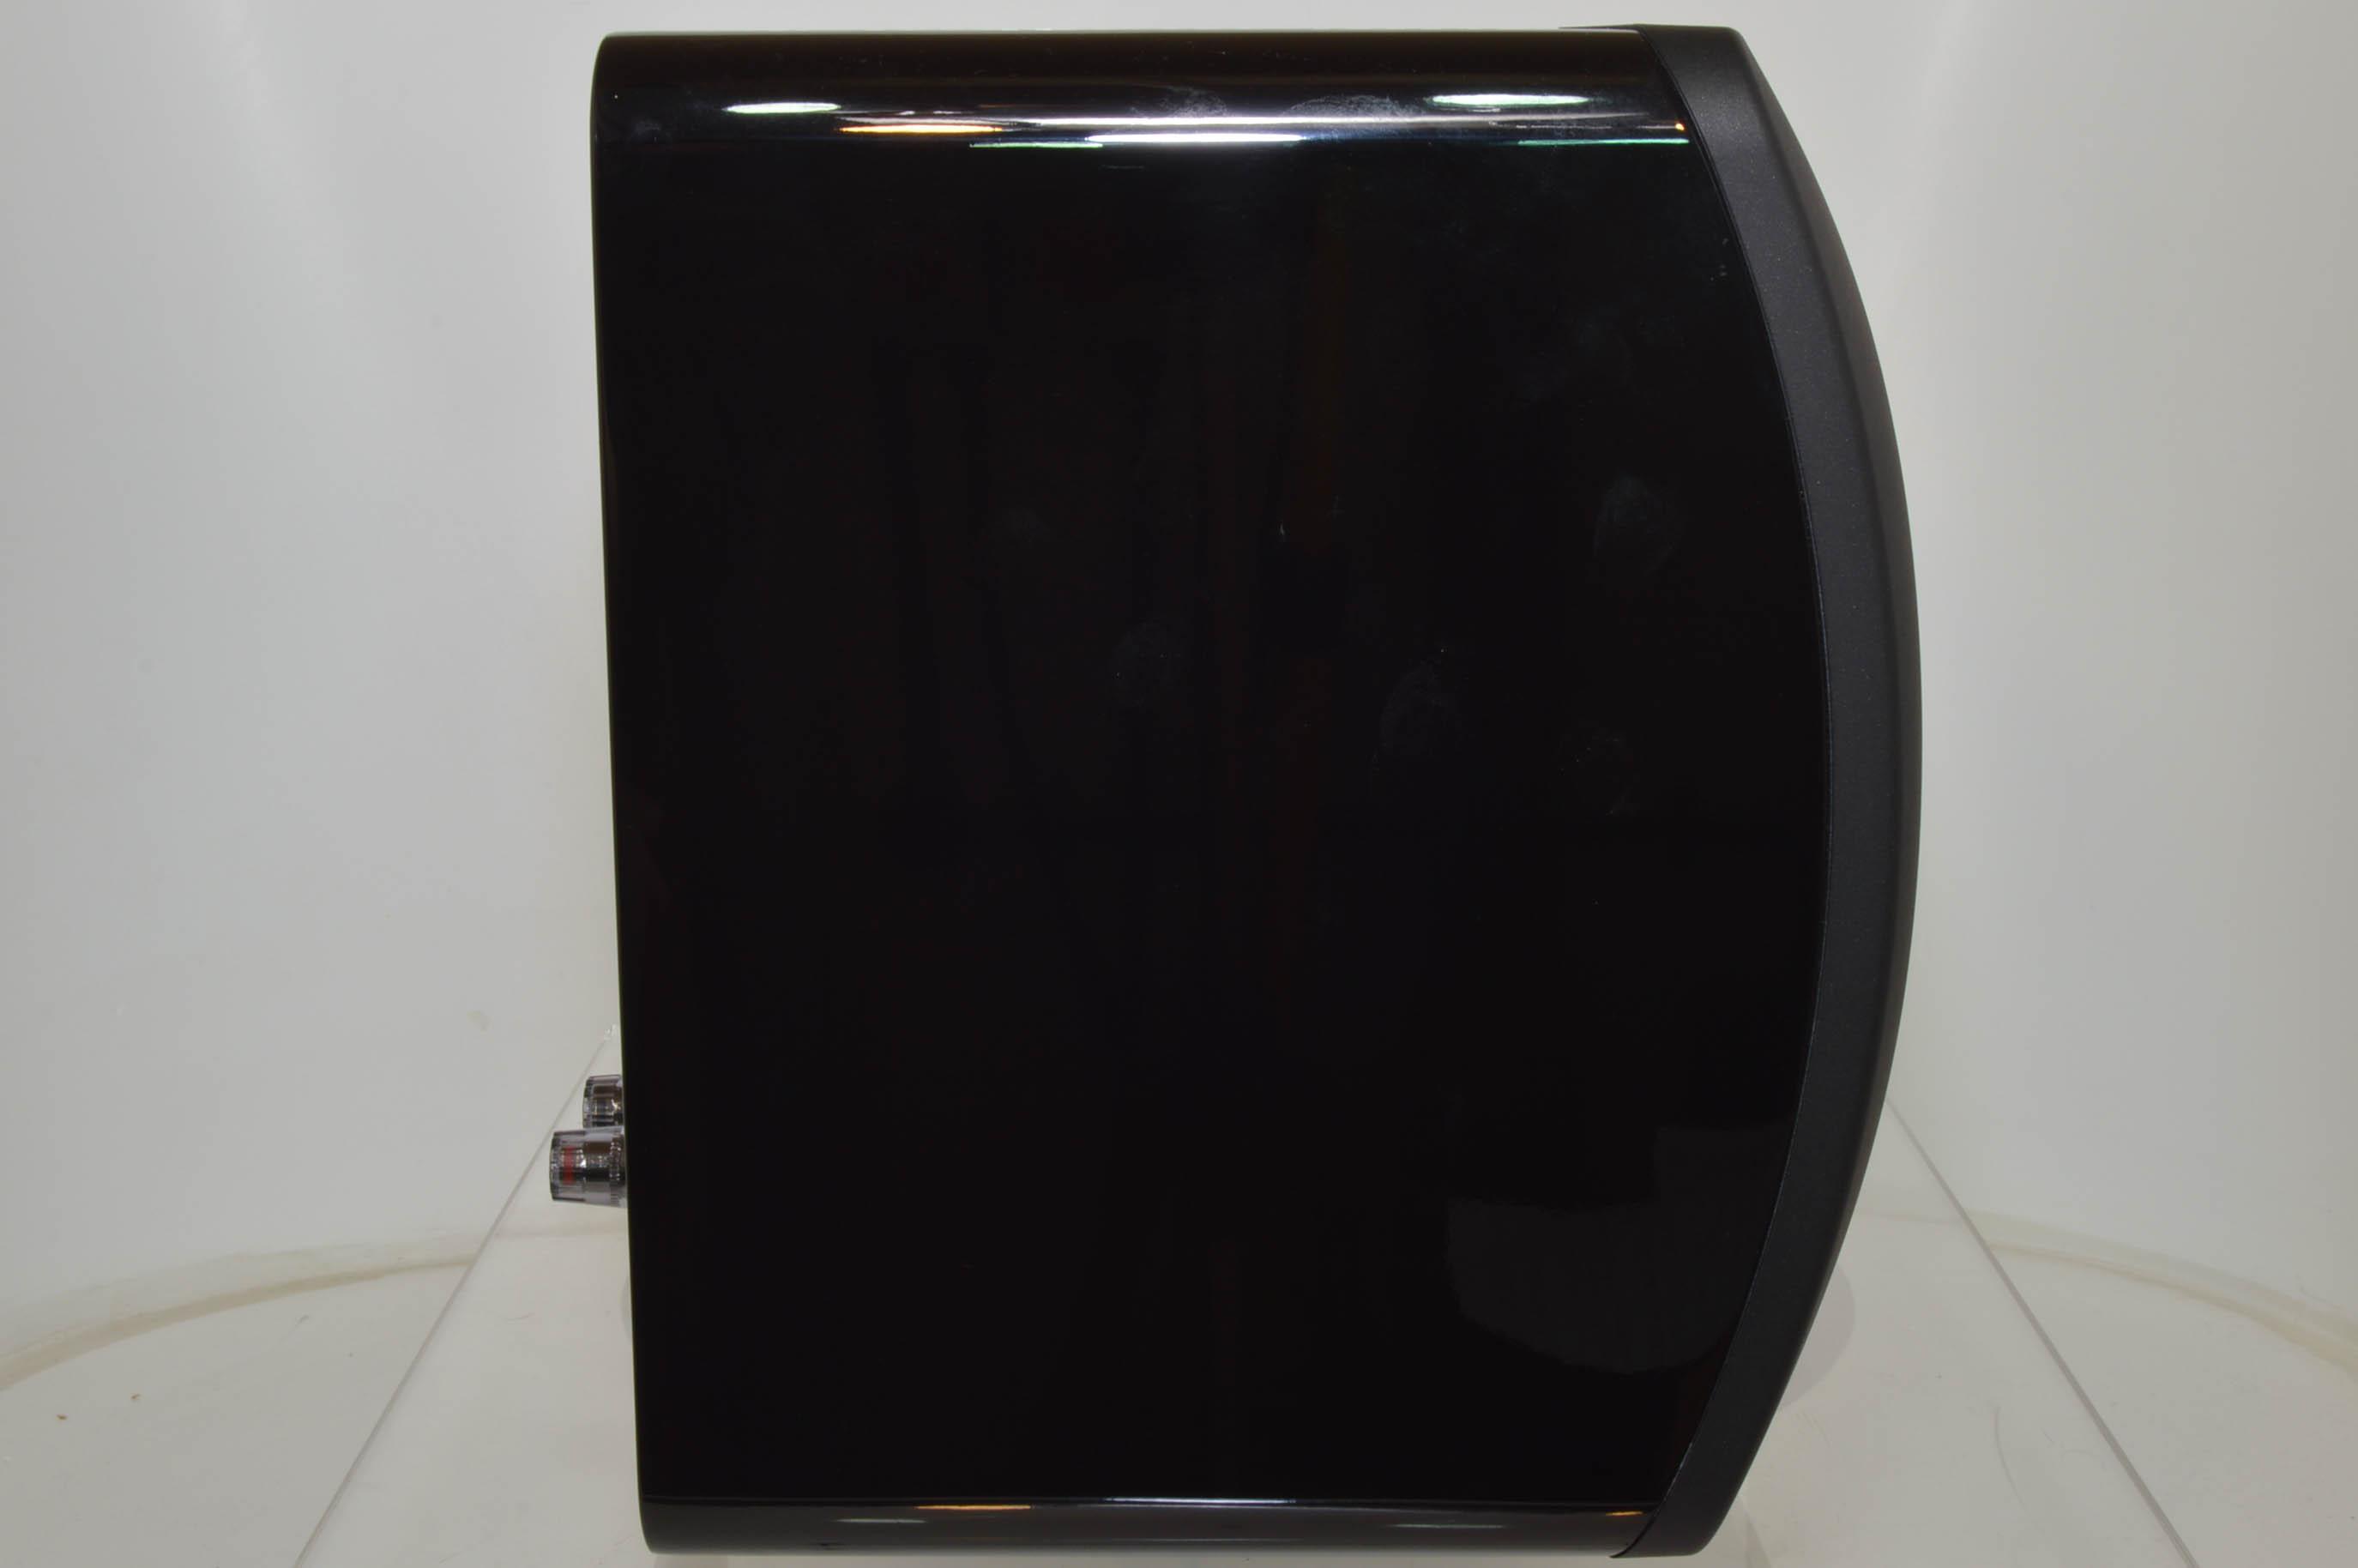 kef ls50 speakers 2ndhandhifi used hifi. Black Bedroom Furniture Sets. Home Design Ideas